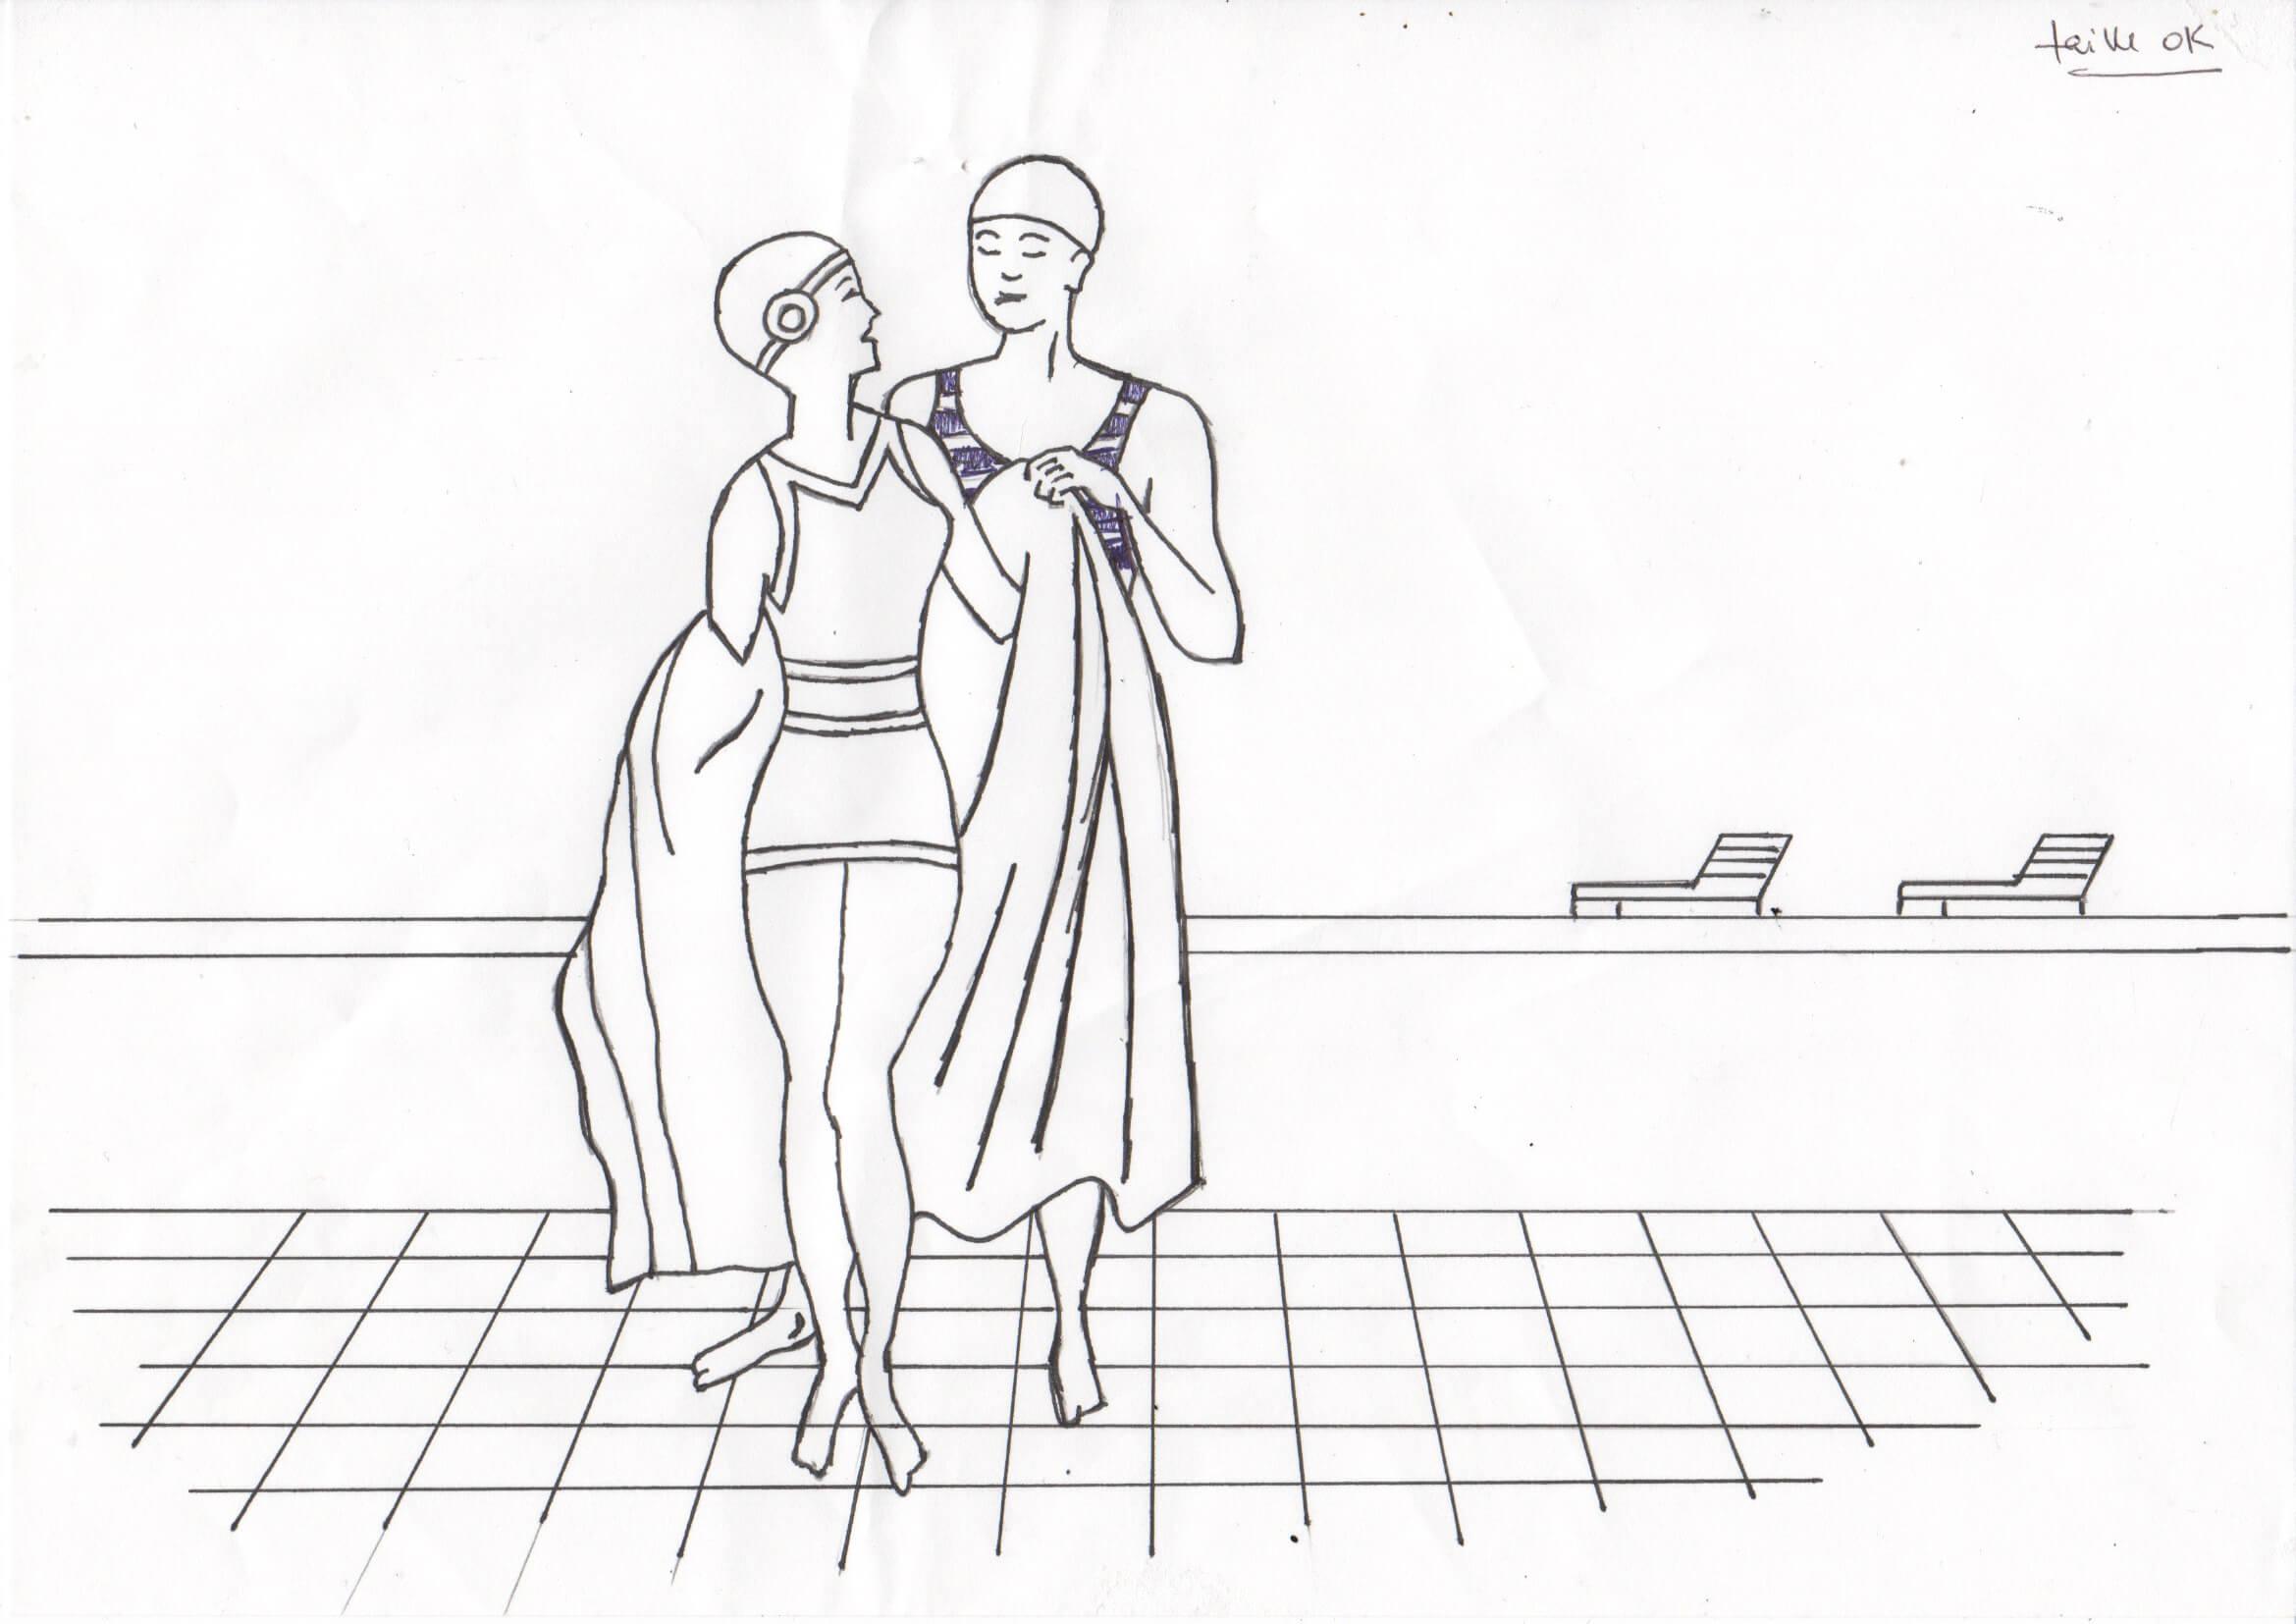 Monsieur tend un peignoir à Madame au sortir du bain